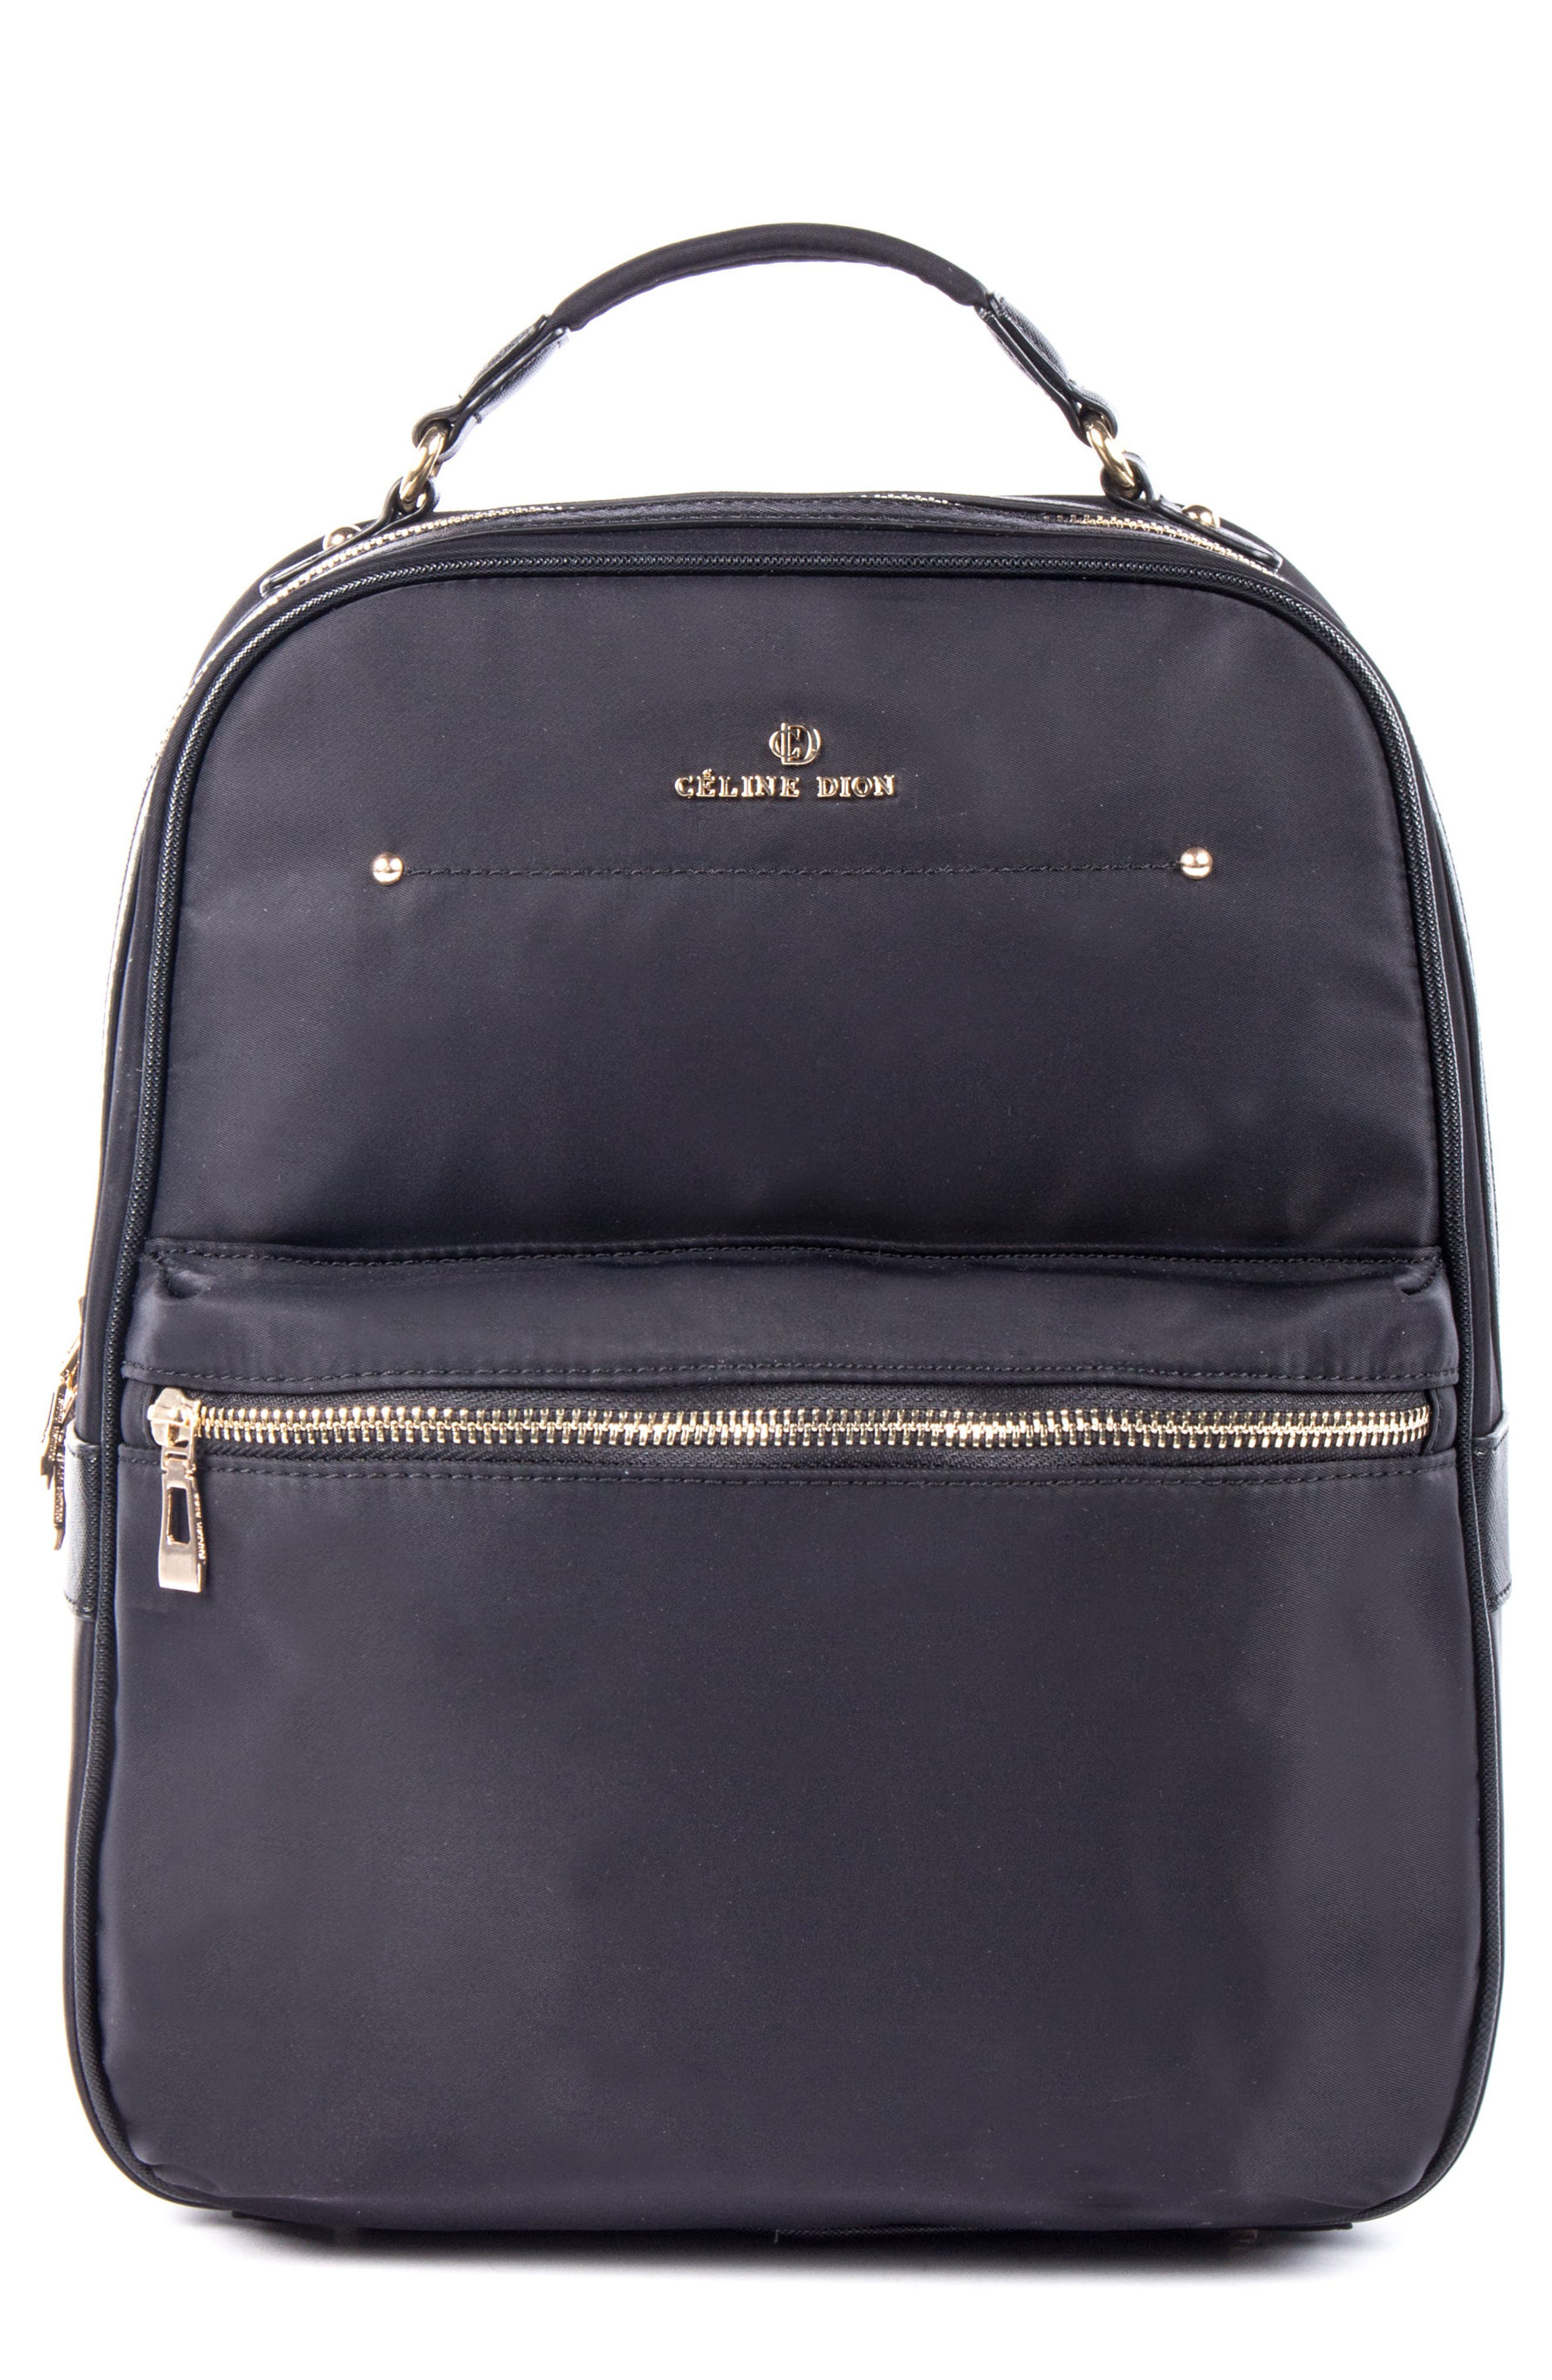 Céline Dion Presto Nylon Backpack,                             Main thumbnail 1, color,